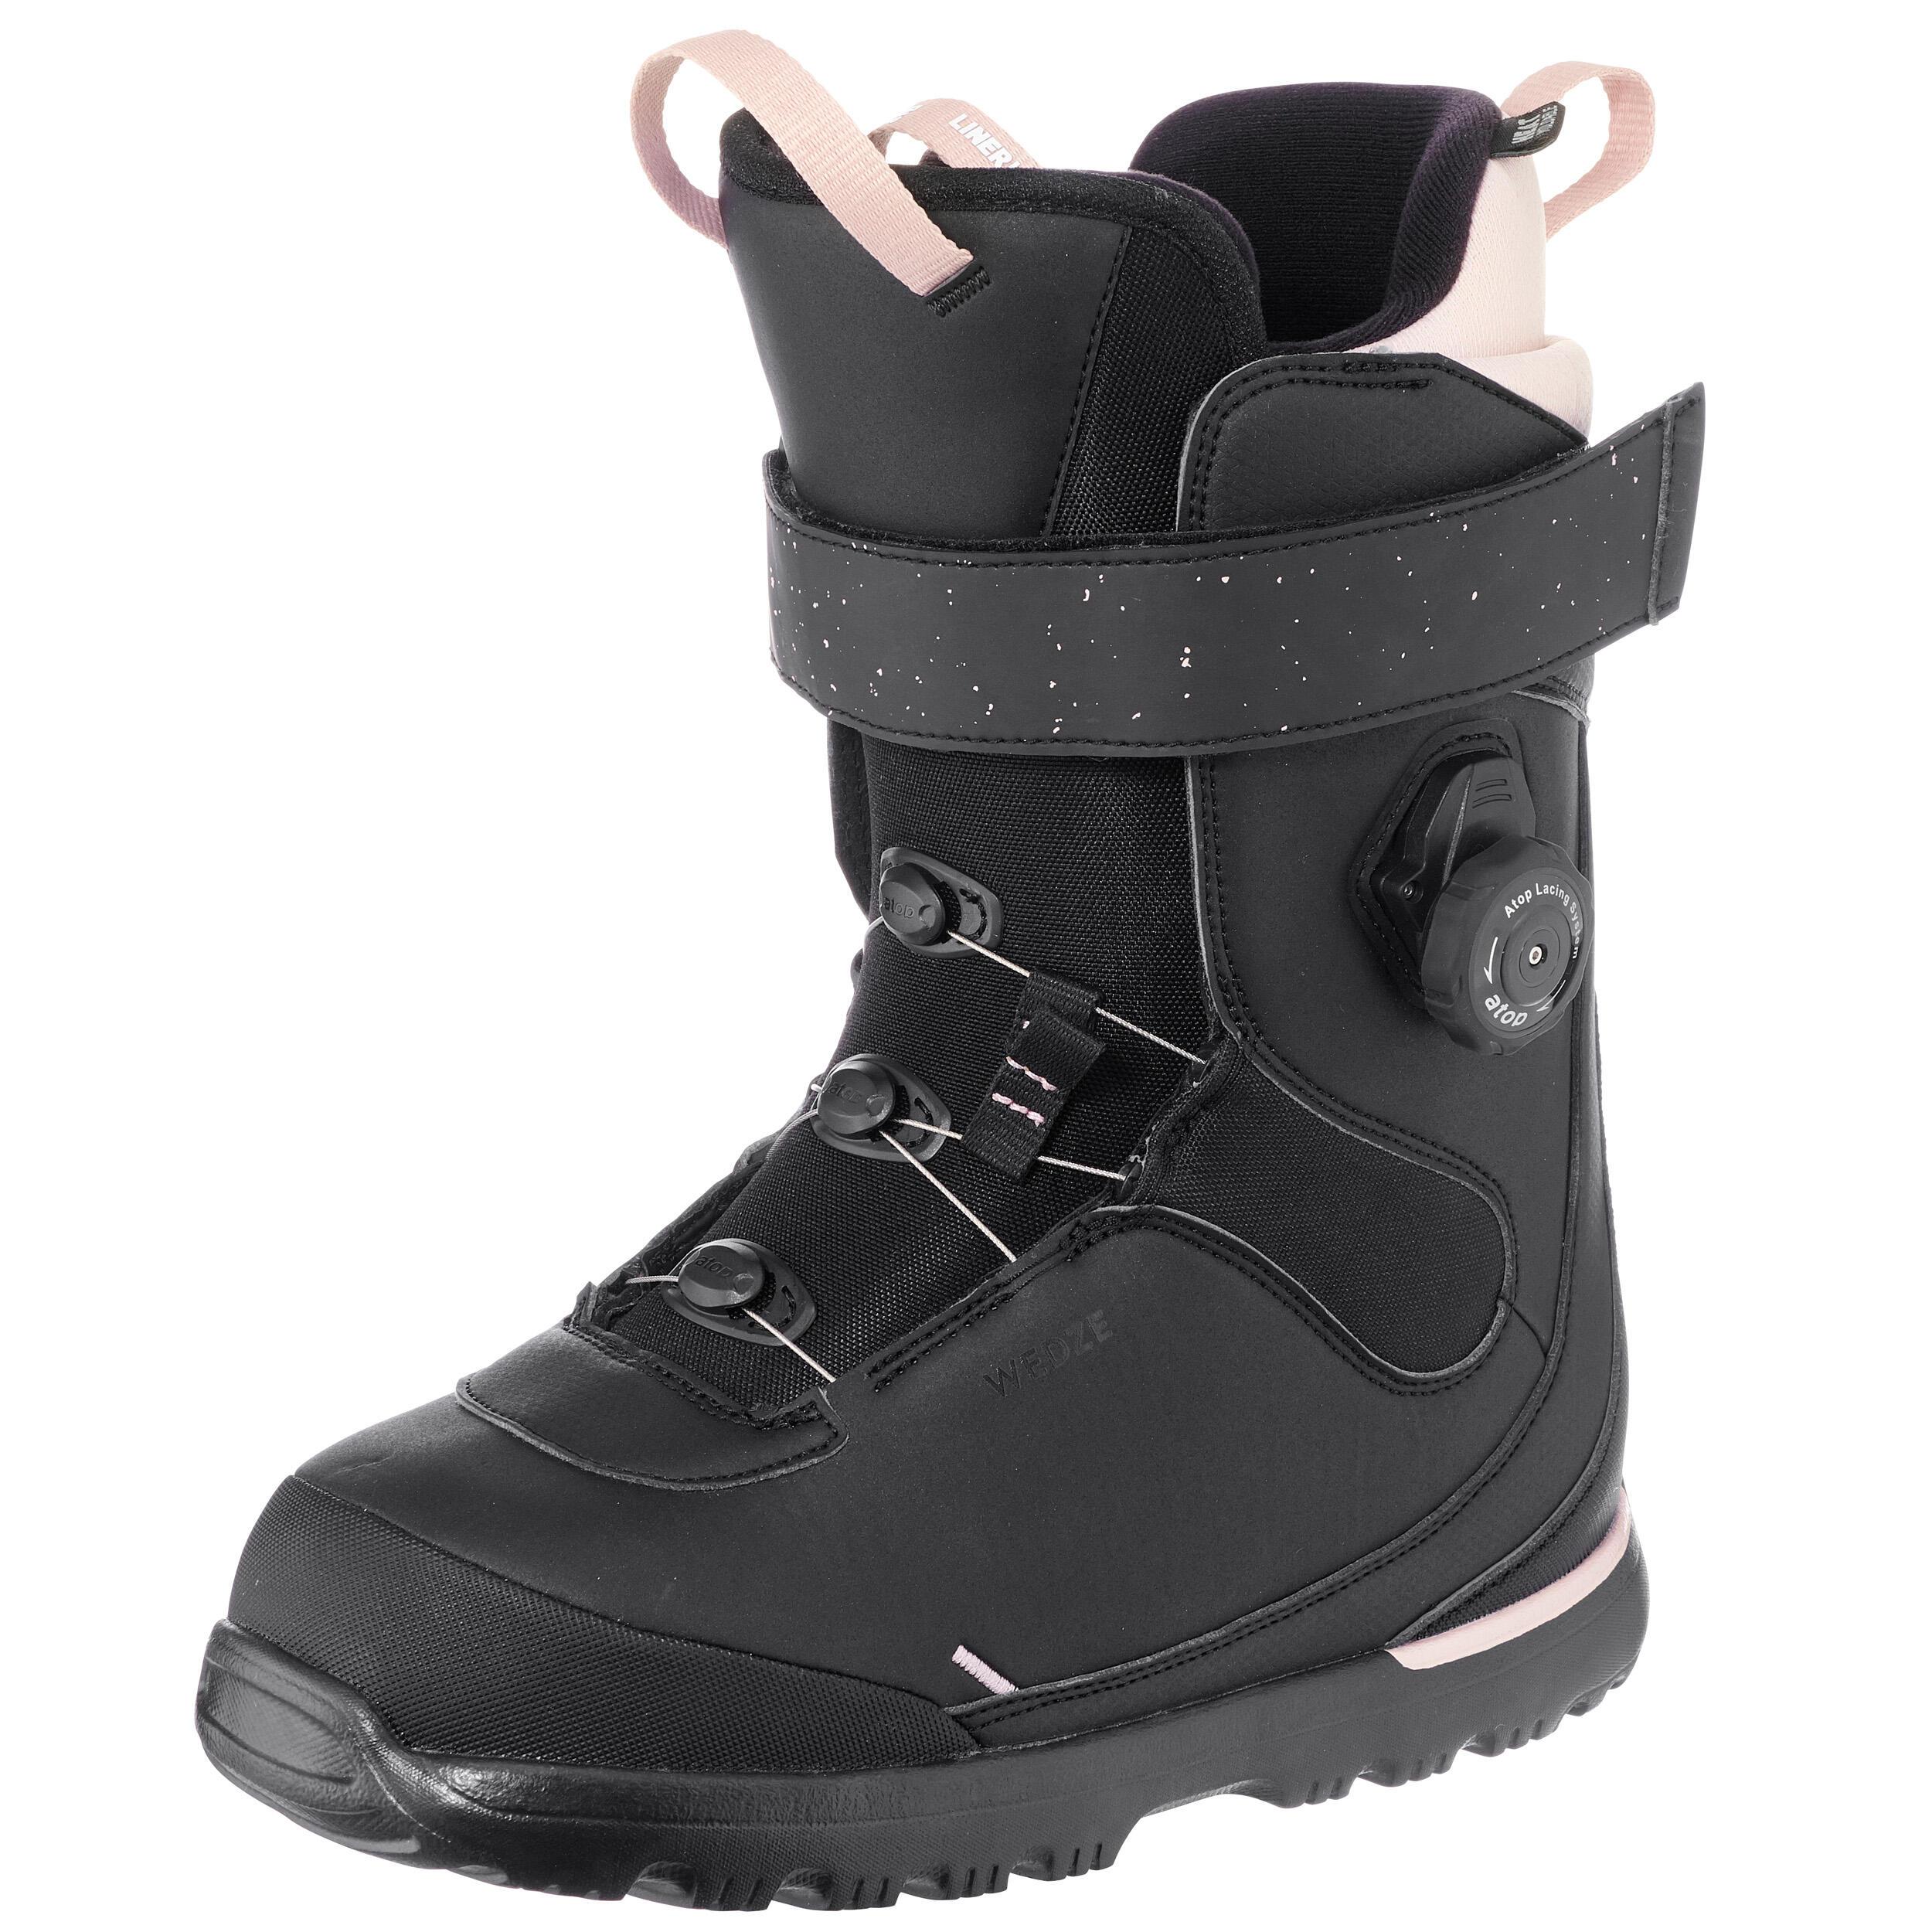 Boots Snowboard Serenity 500 imagine